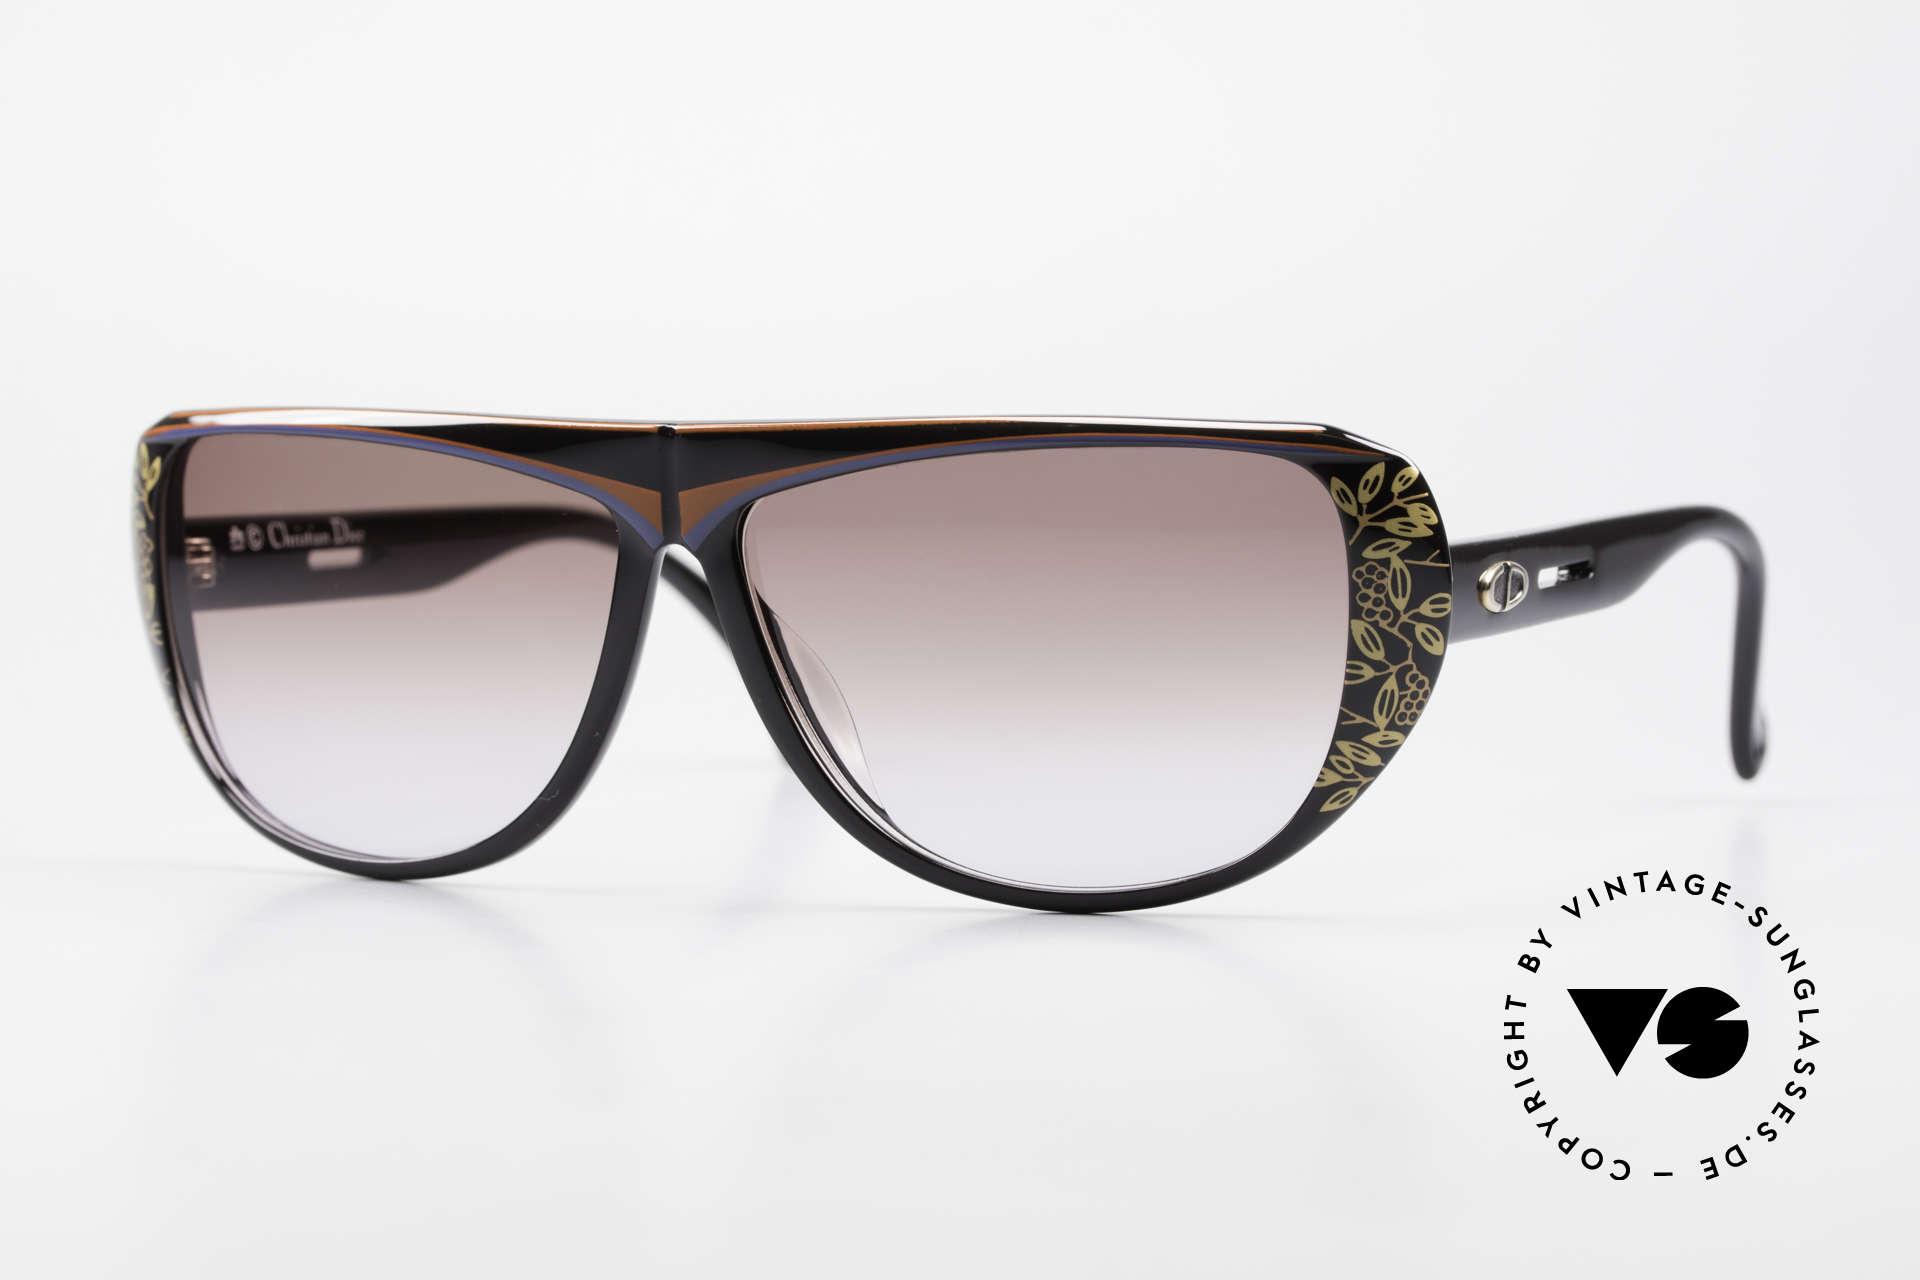 Christian Dior 2421 Ladies Sunglasses 80's Optyl, beautiful Christian Dior ladies sunglasses from 1989, Made for Women